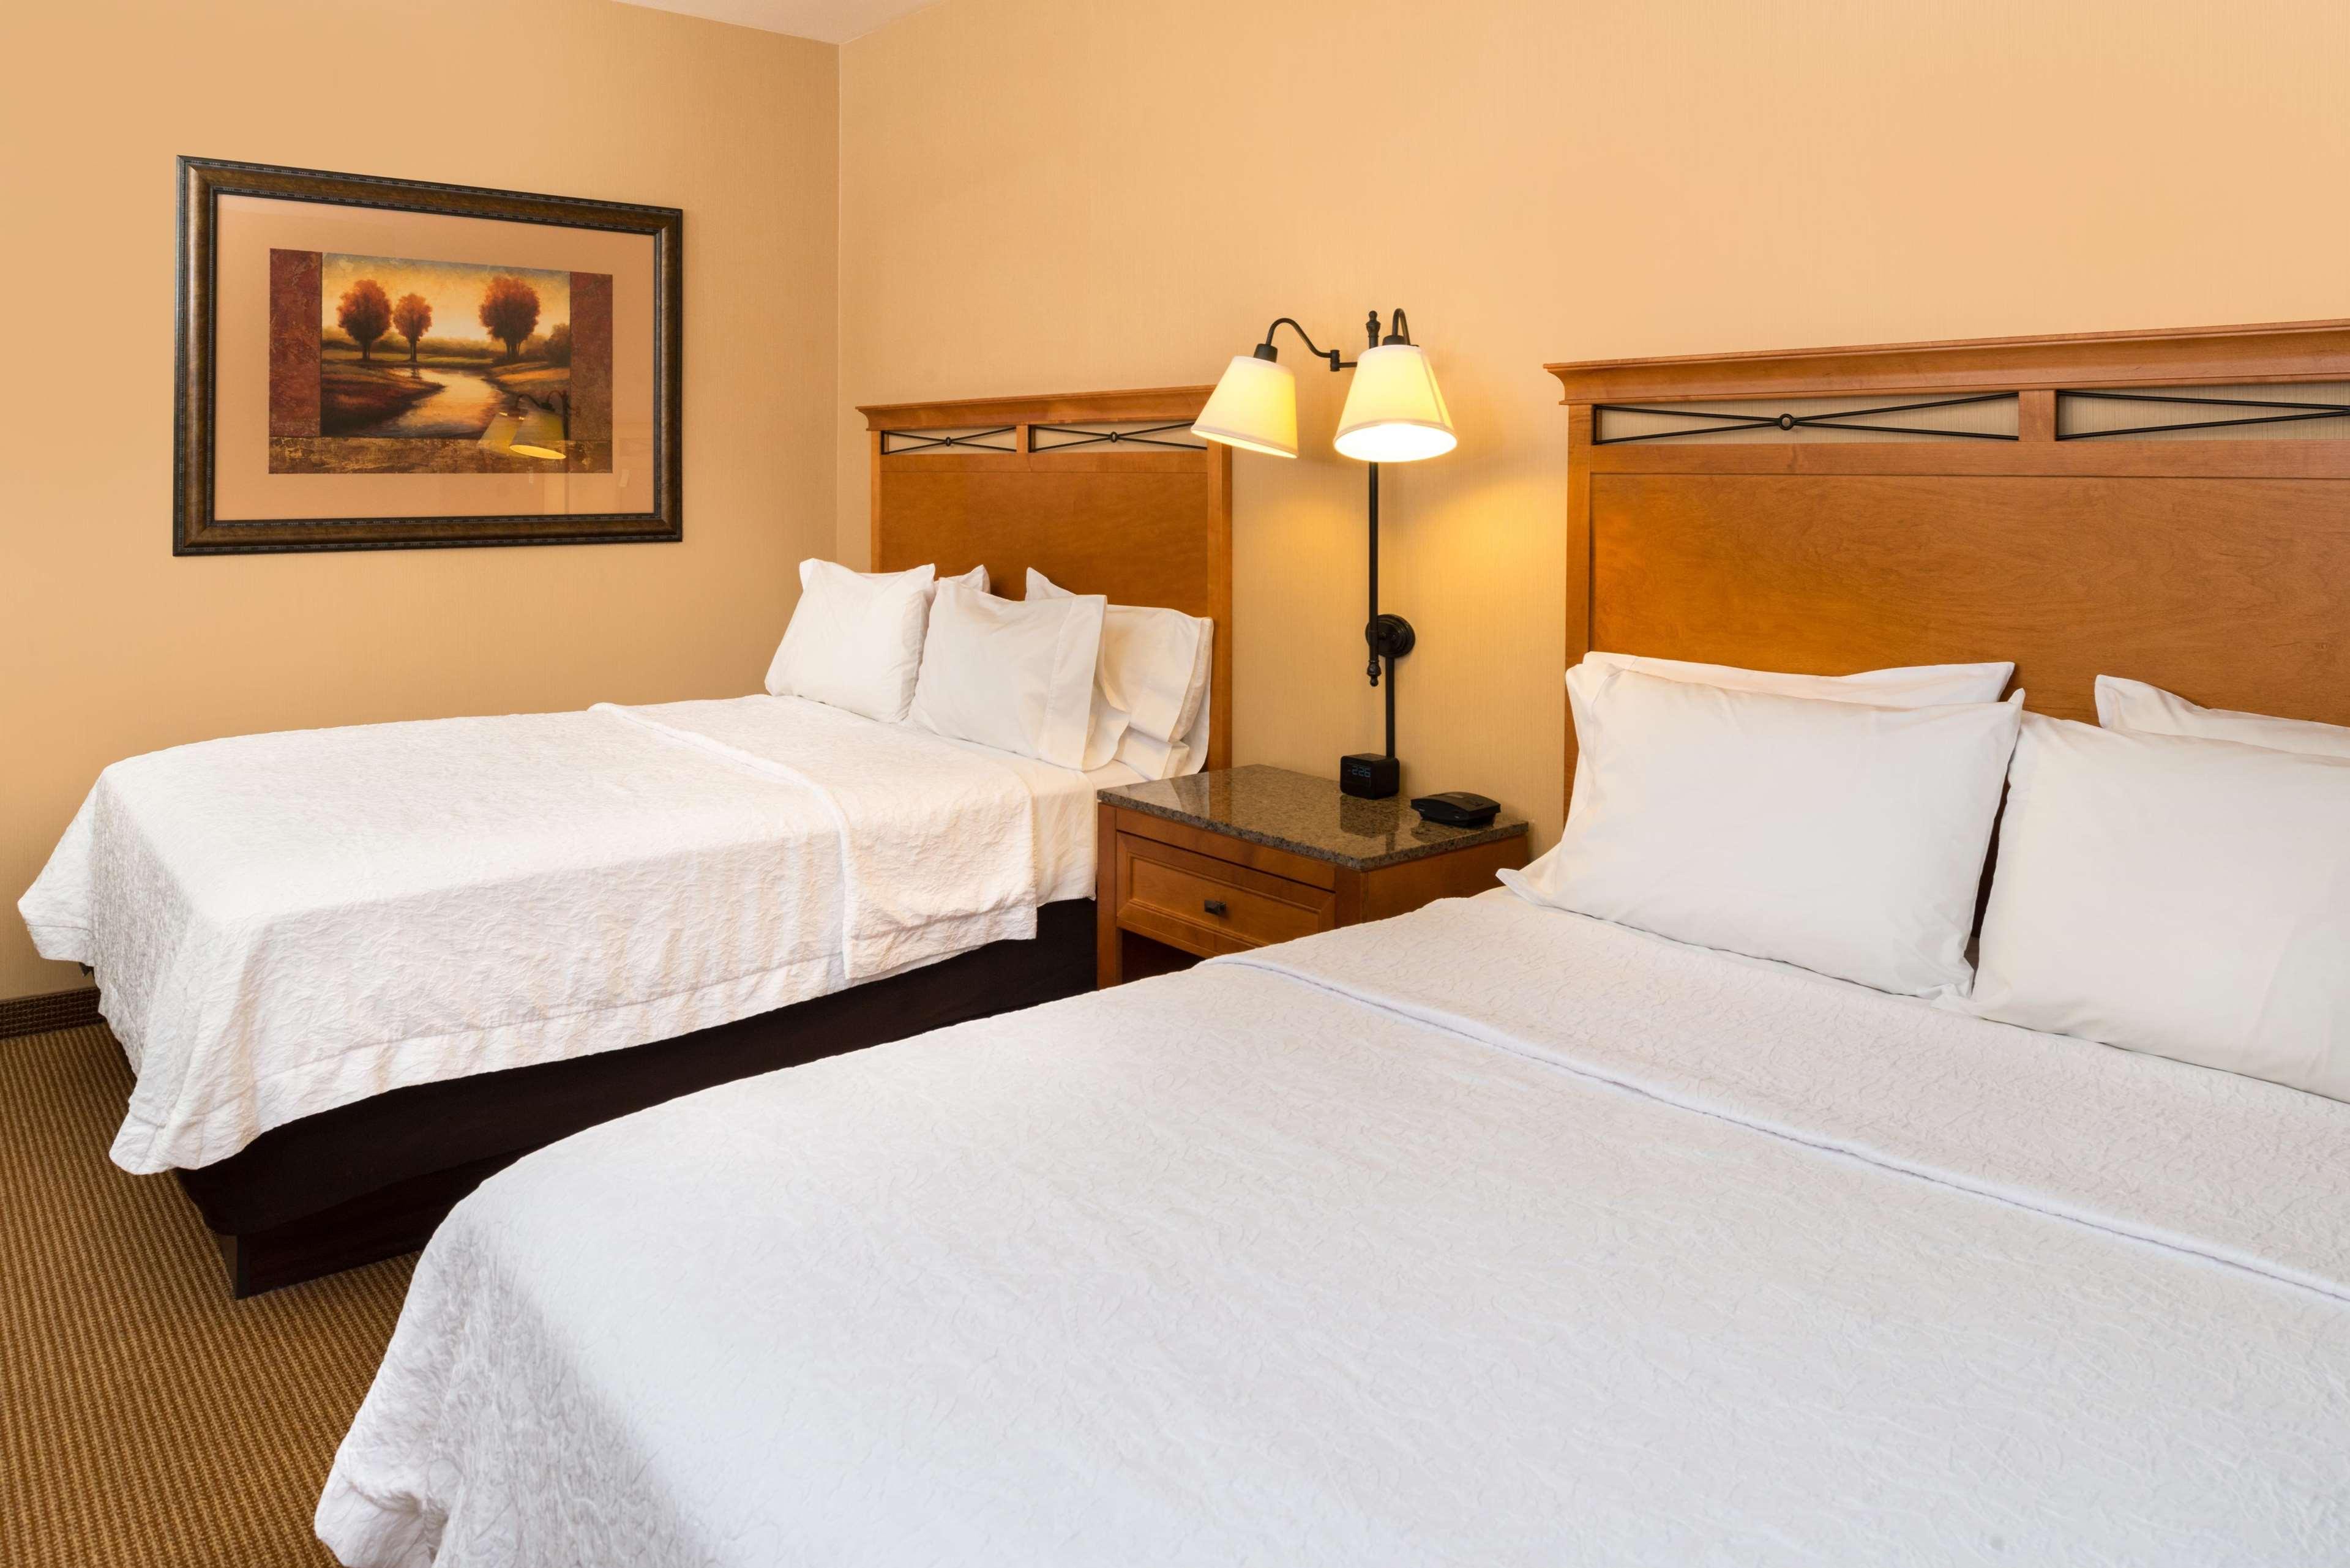 Hampton Inn & Suites Salt Lake City-West Jordan image 42